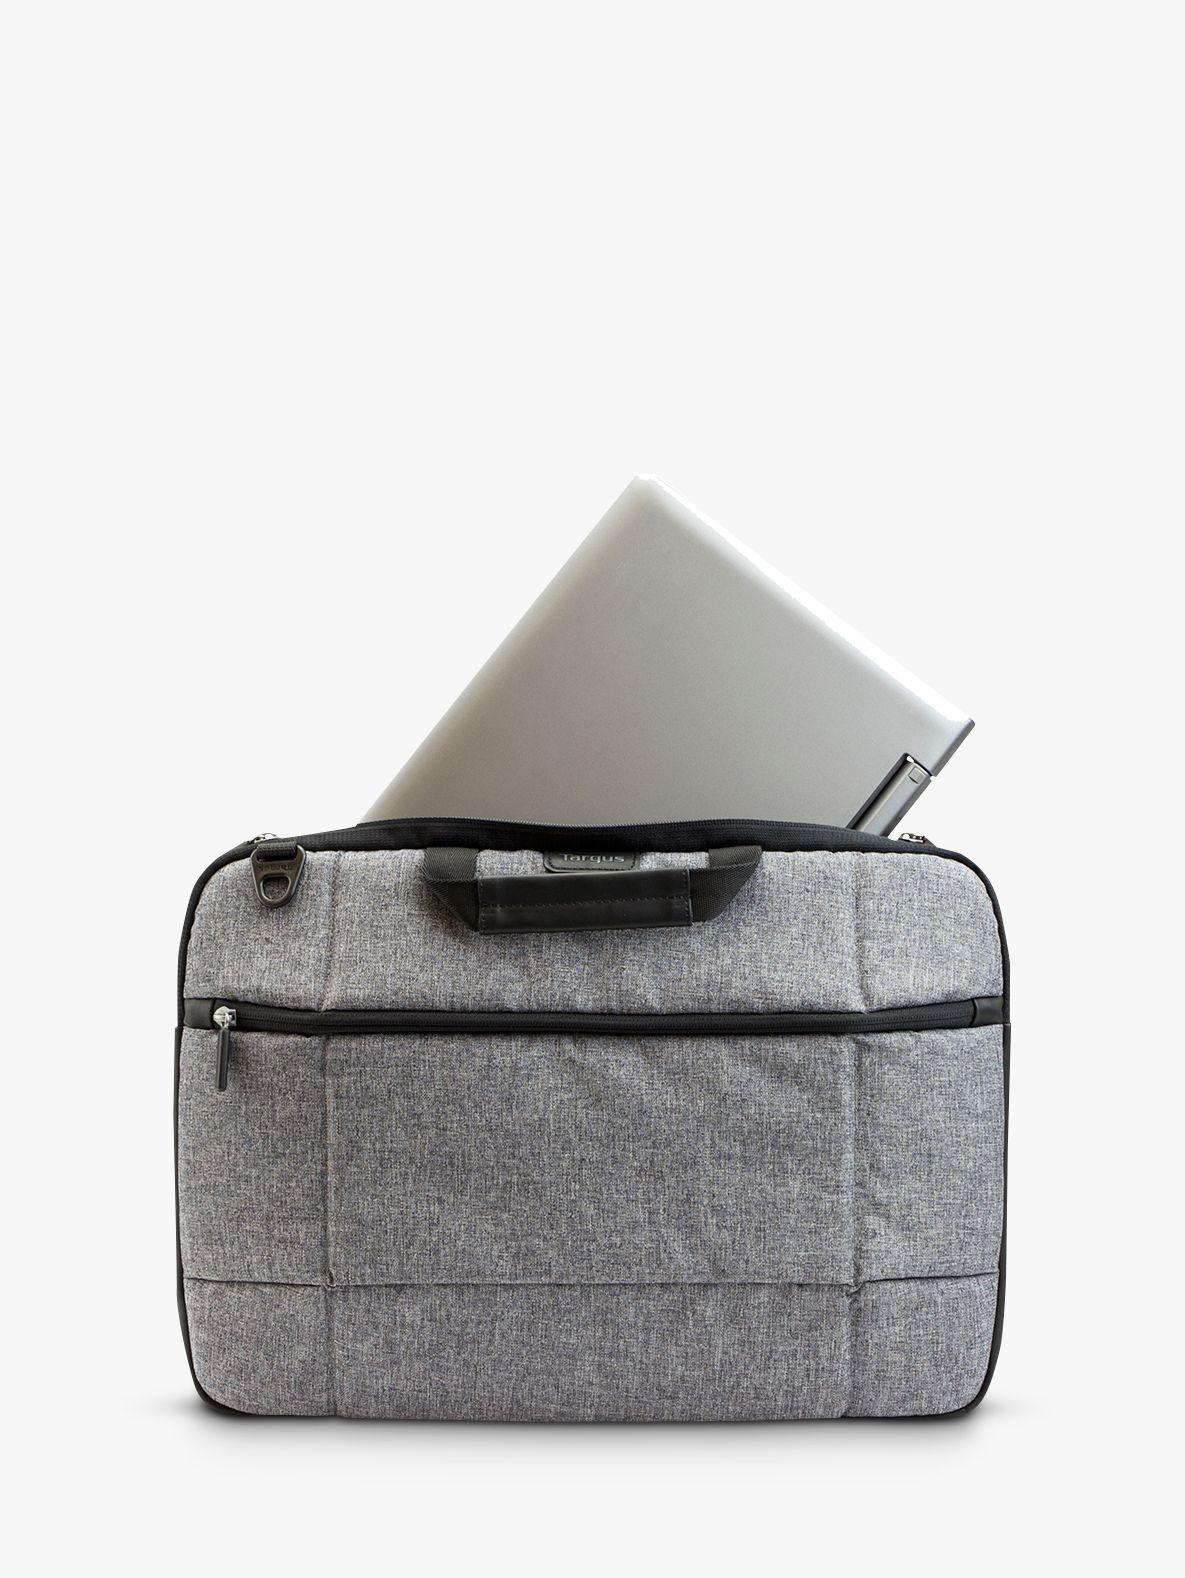 Targus Targus Strata Pro Case for Laptops up to 15.6, Grey